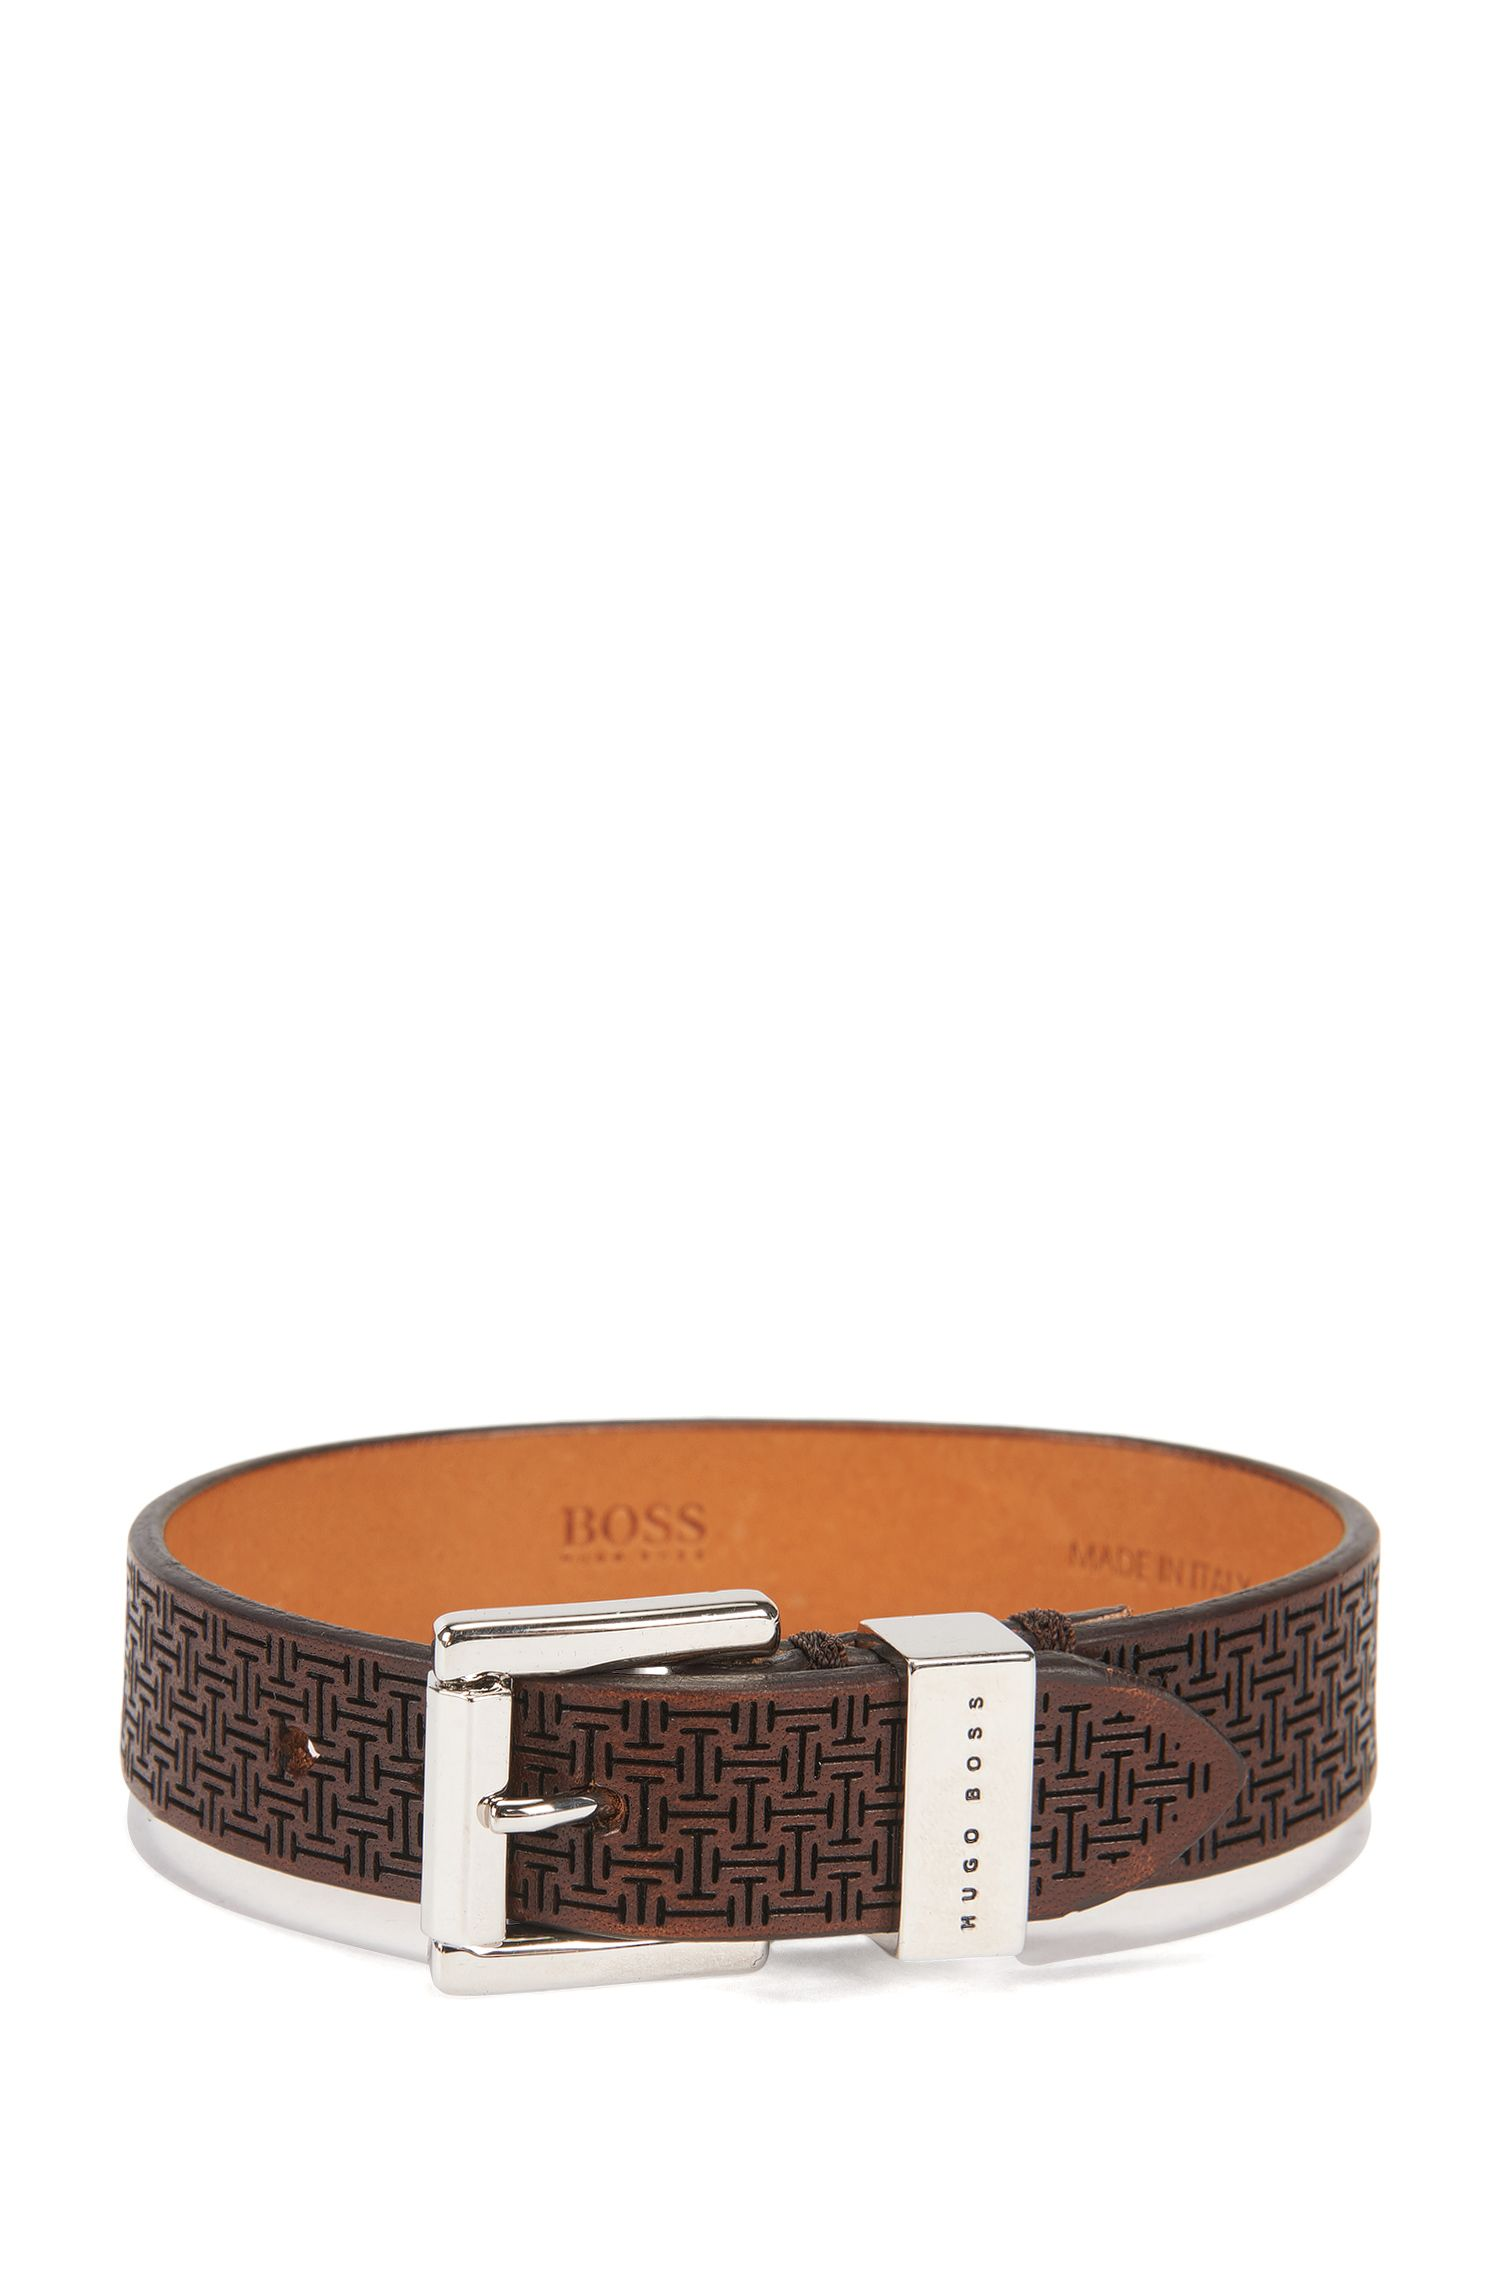 Armband aus edlem Leder mit gelasertem Muster